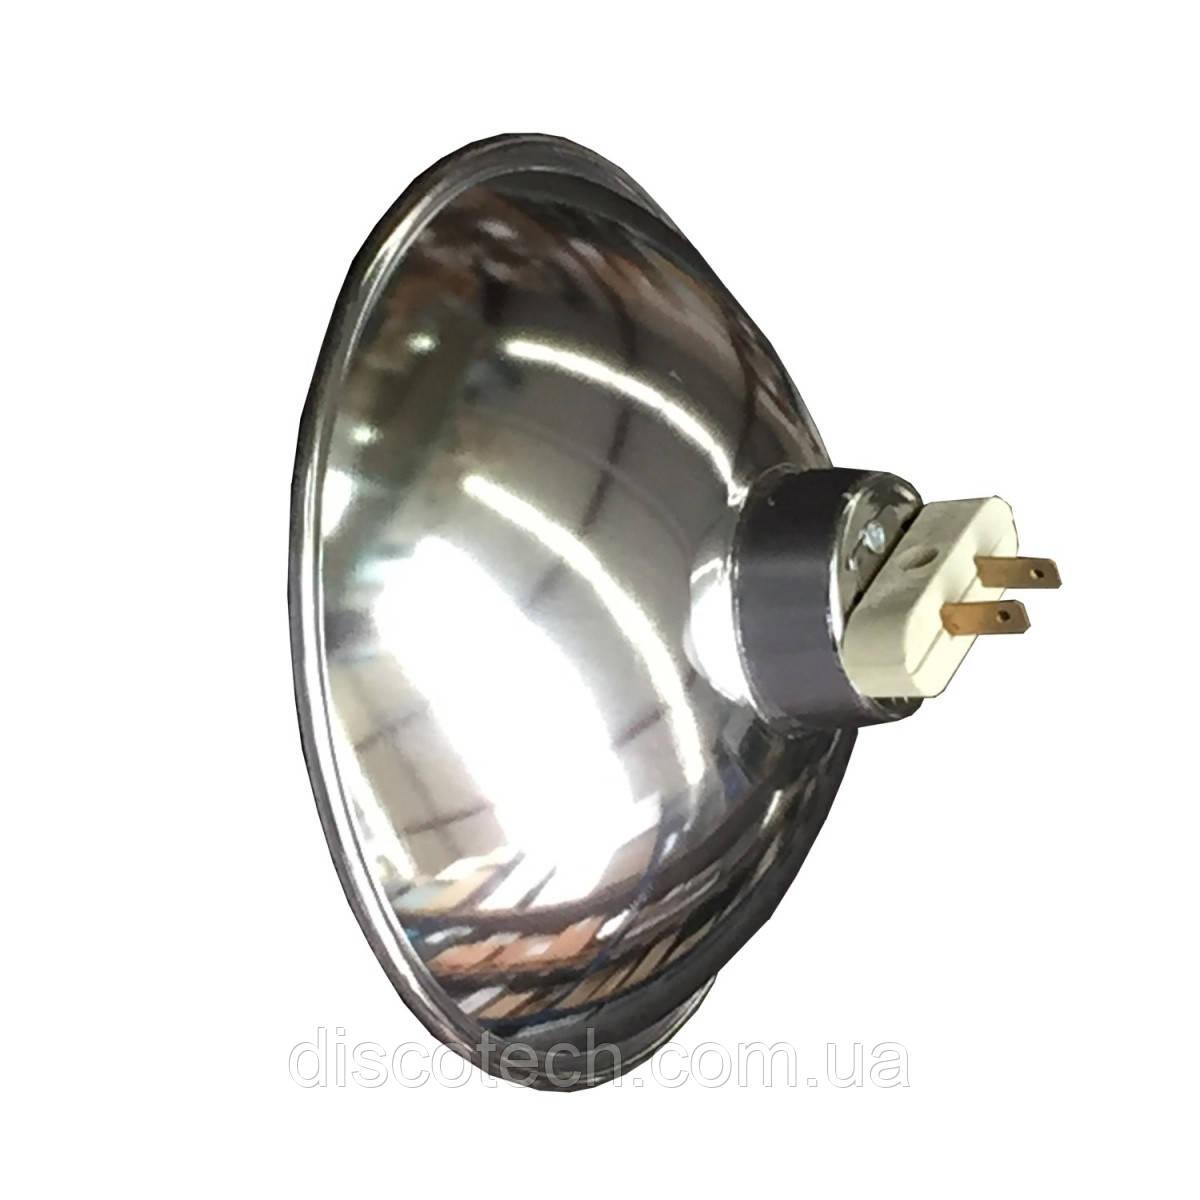 DTS Reflector Par 64 GX 9,5